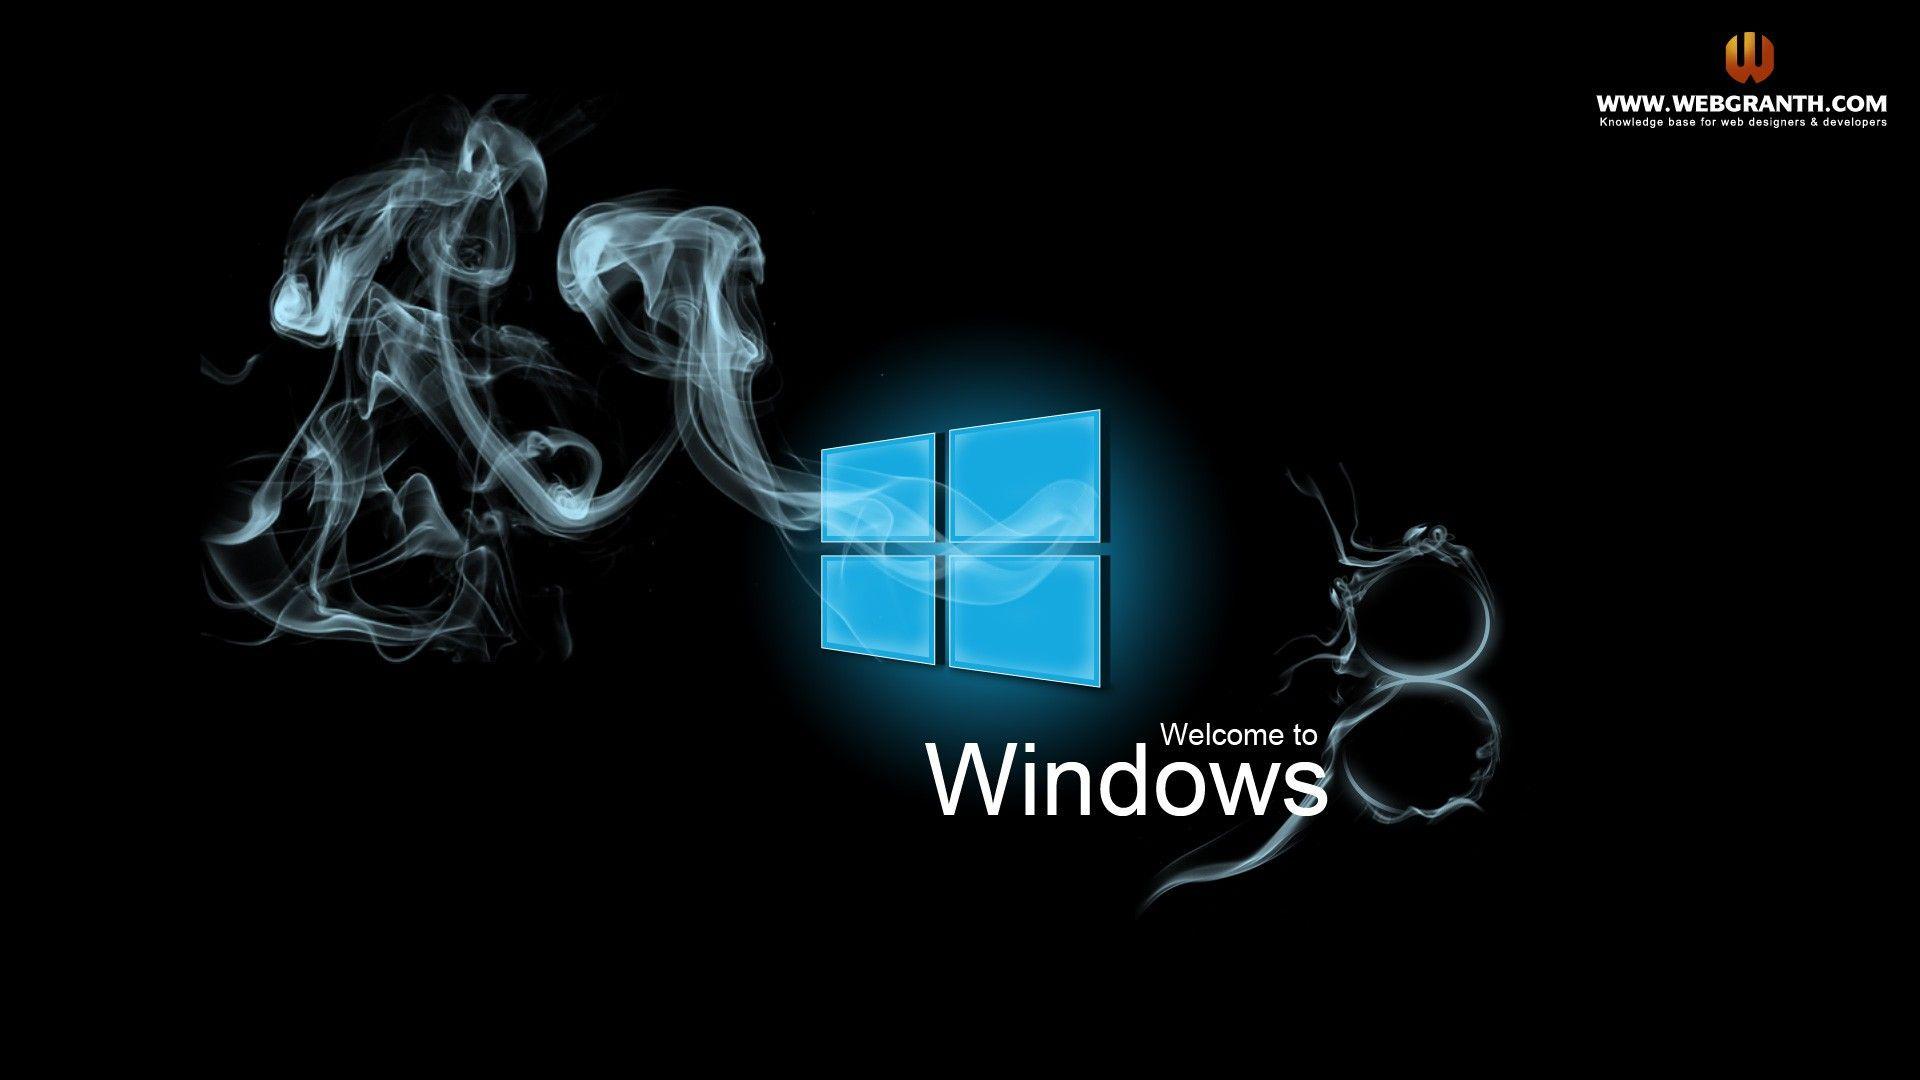 Luxury Pc Live Wallpaper Windows 8 1